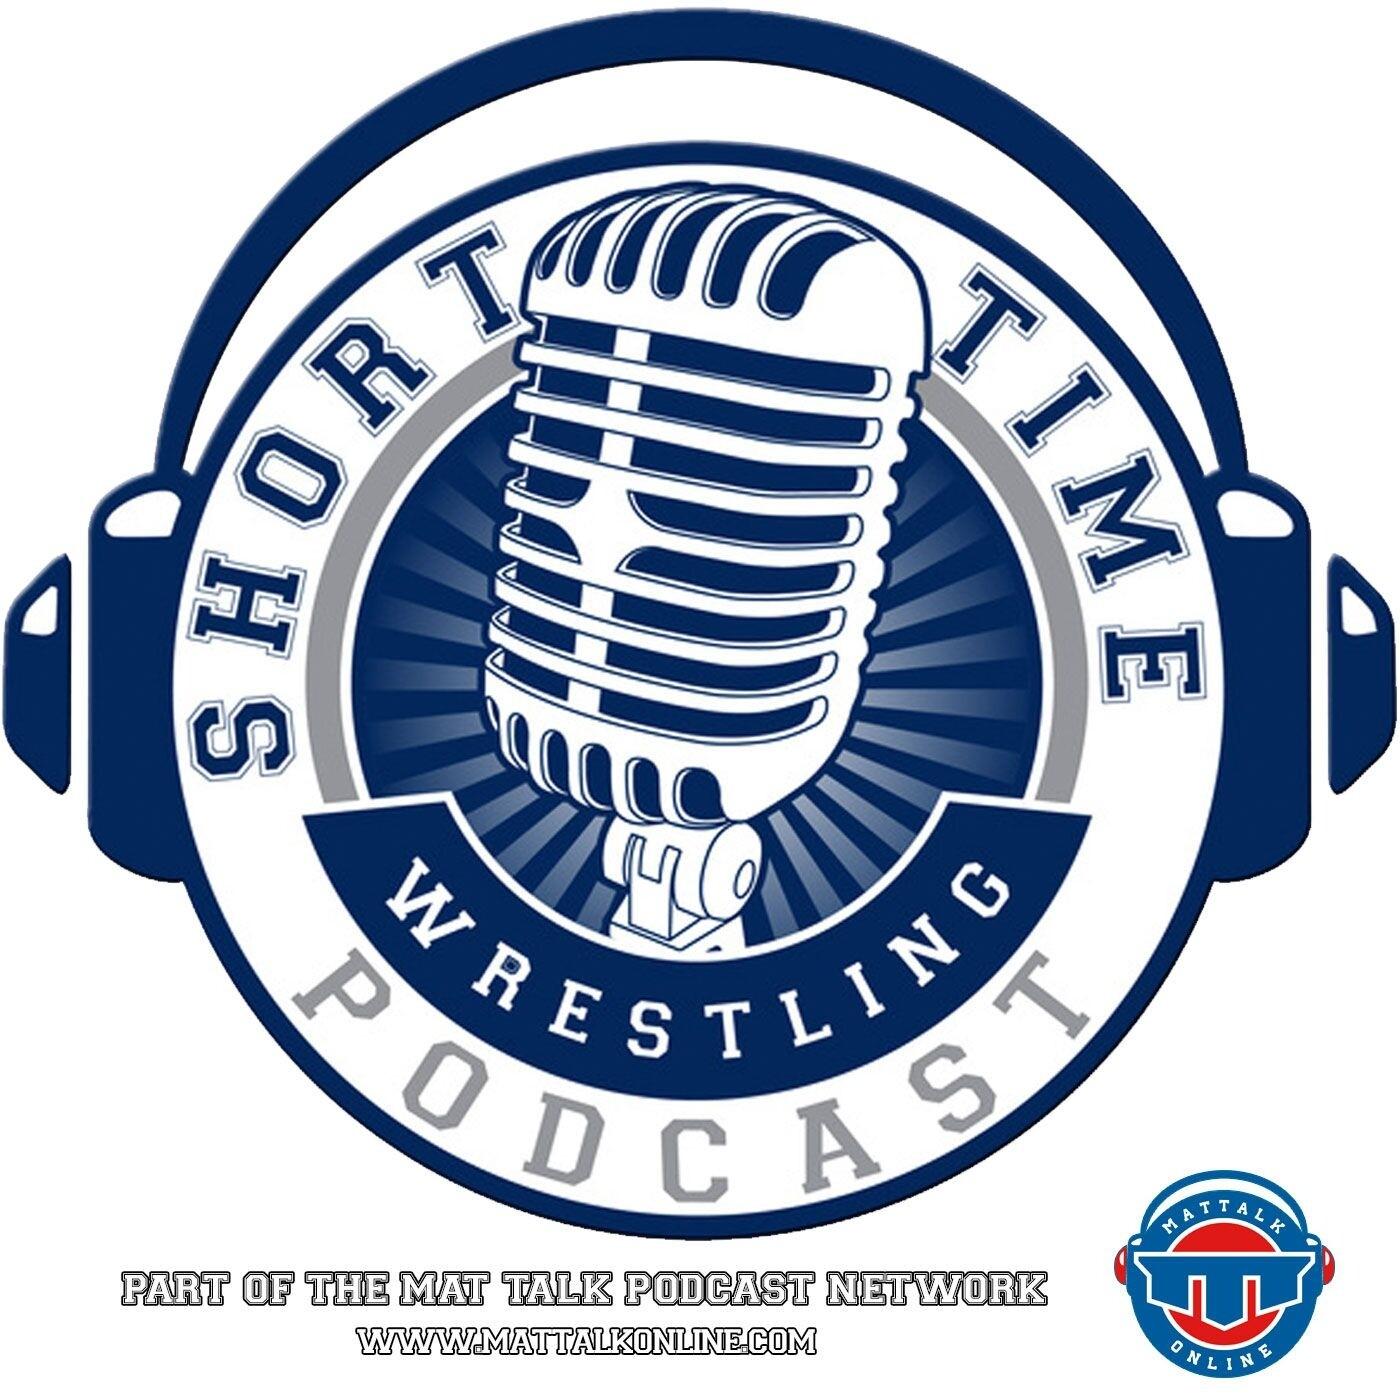 Patrick Kelly educating the wrestling world in Kansas through podcasting